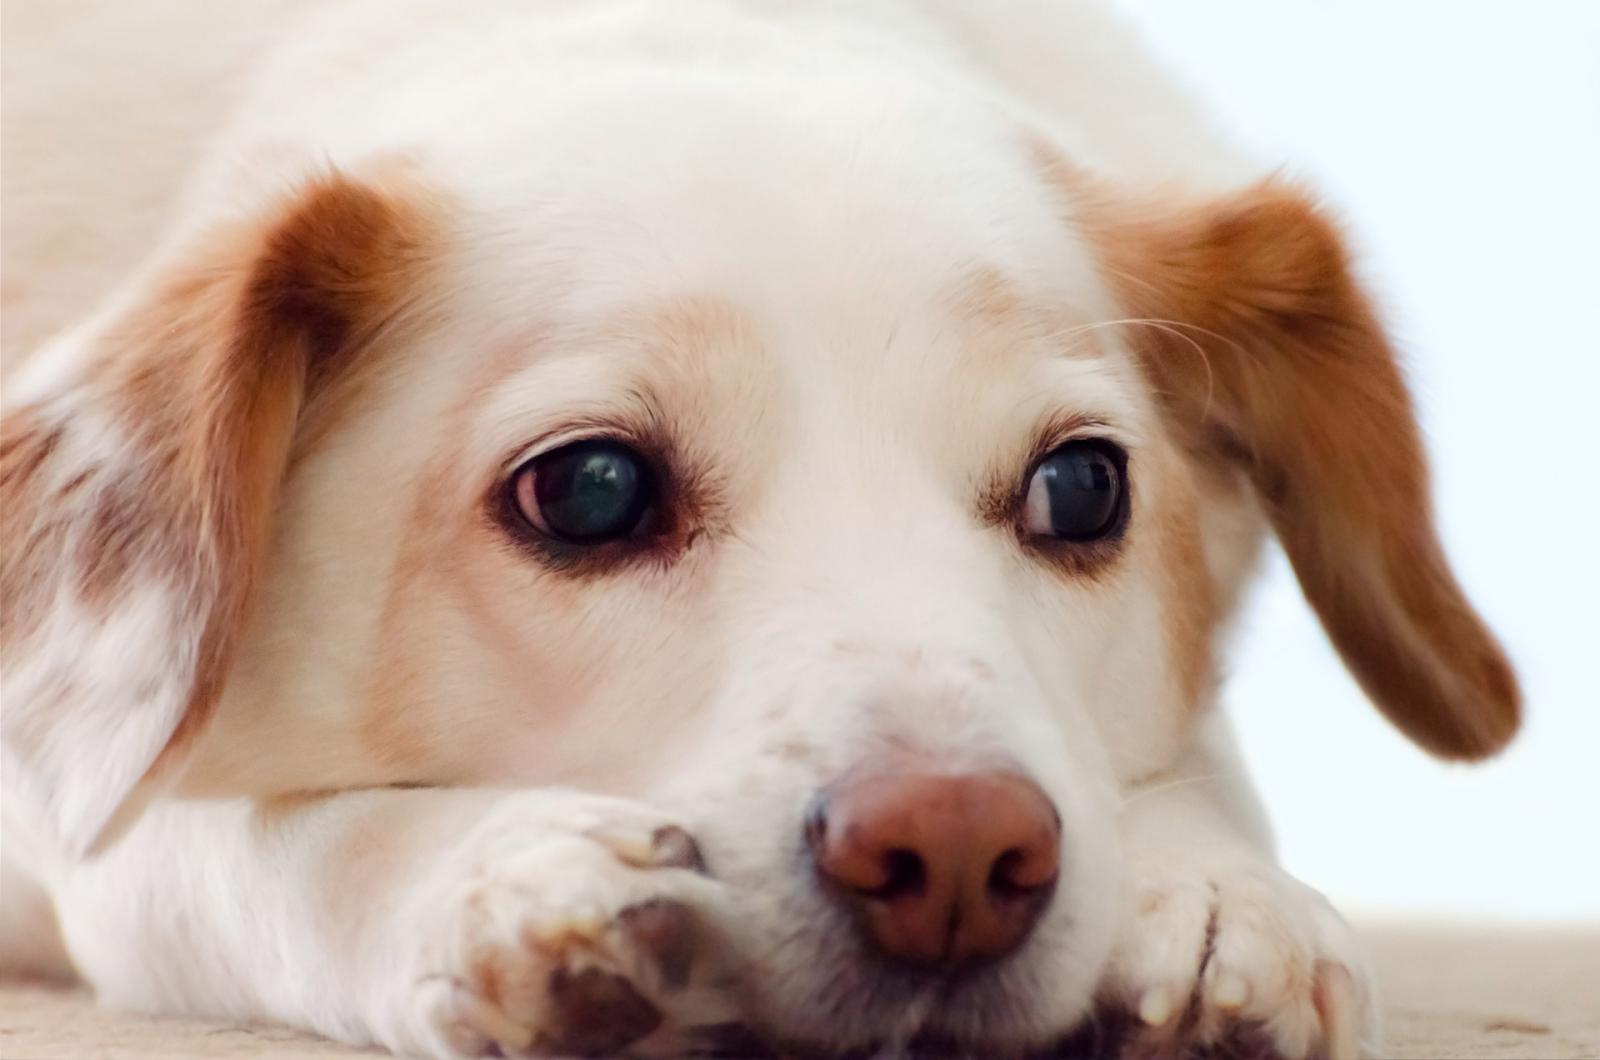 sad puppy looks away